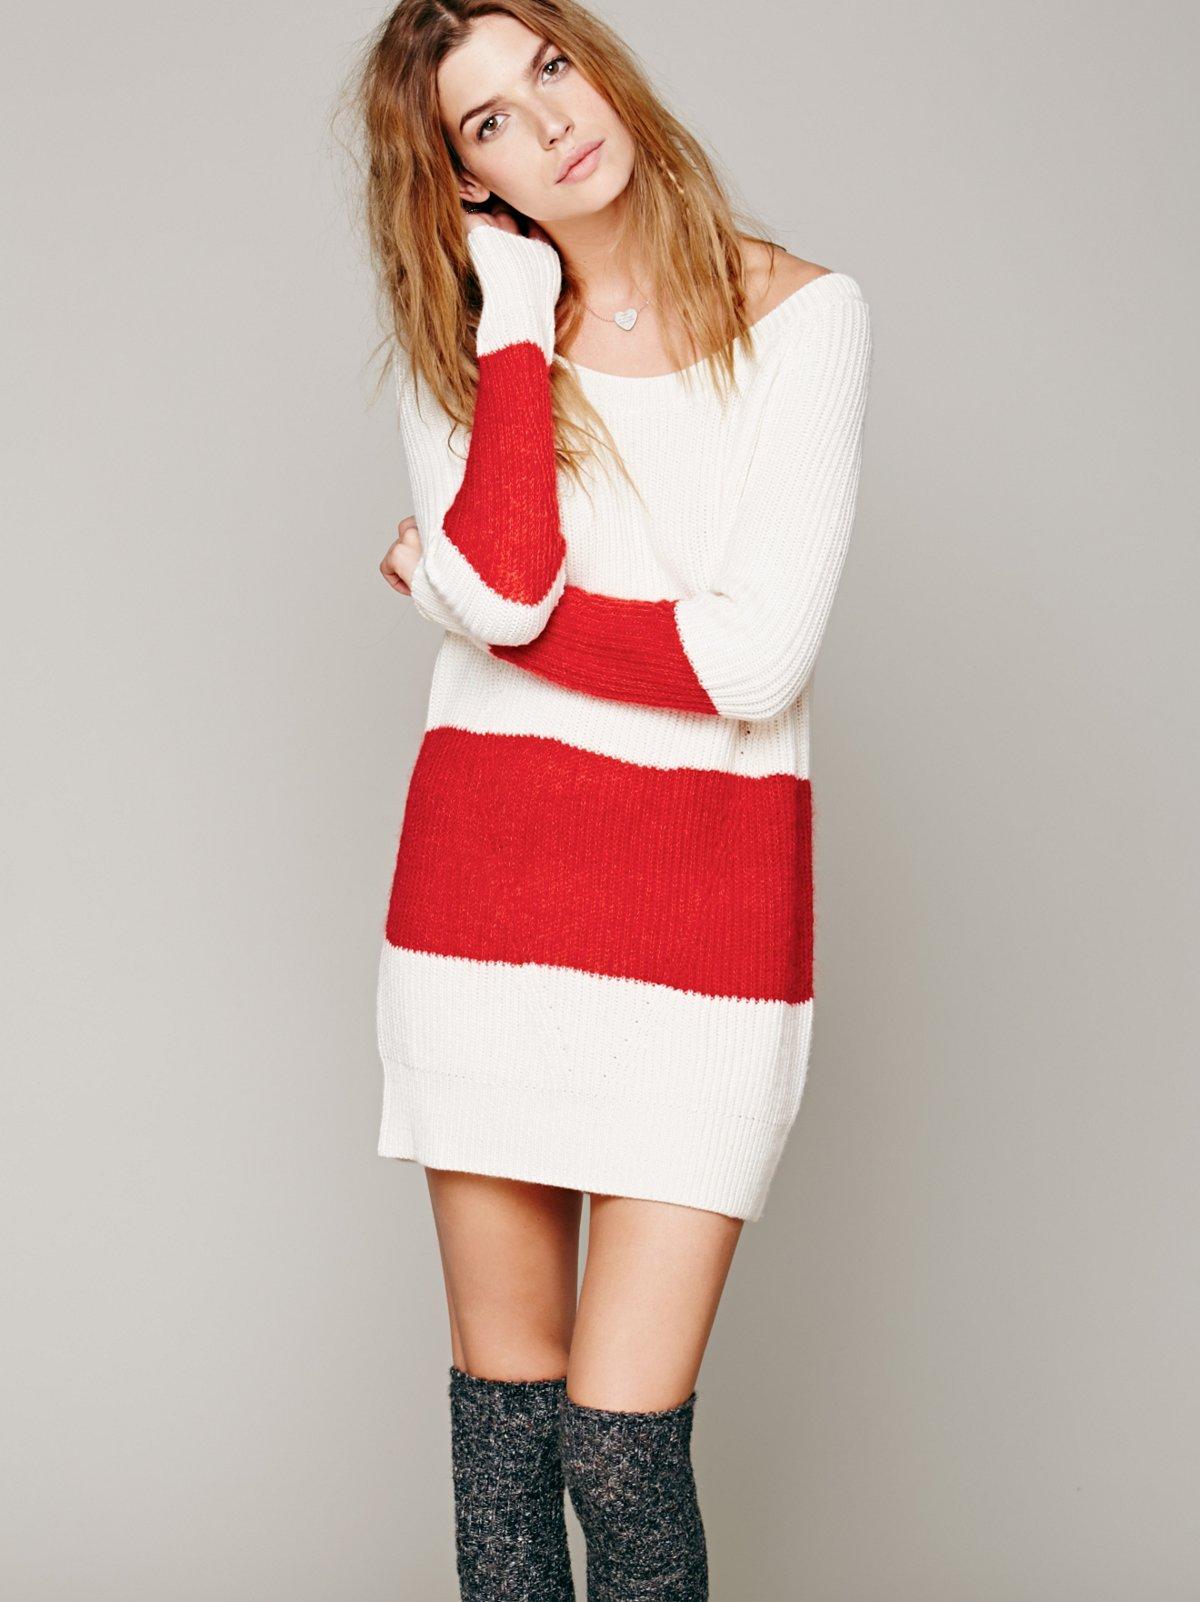 Mod Stripe Tunic